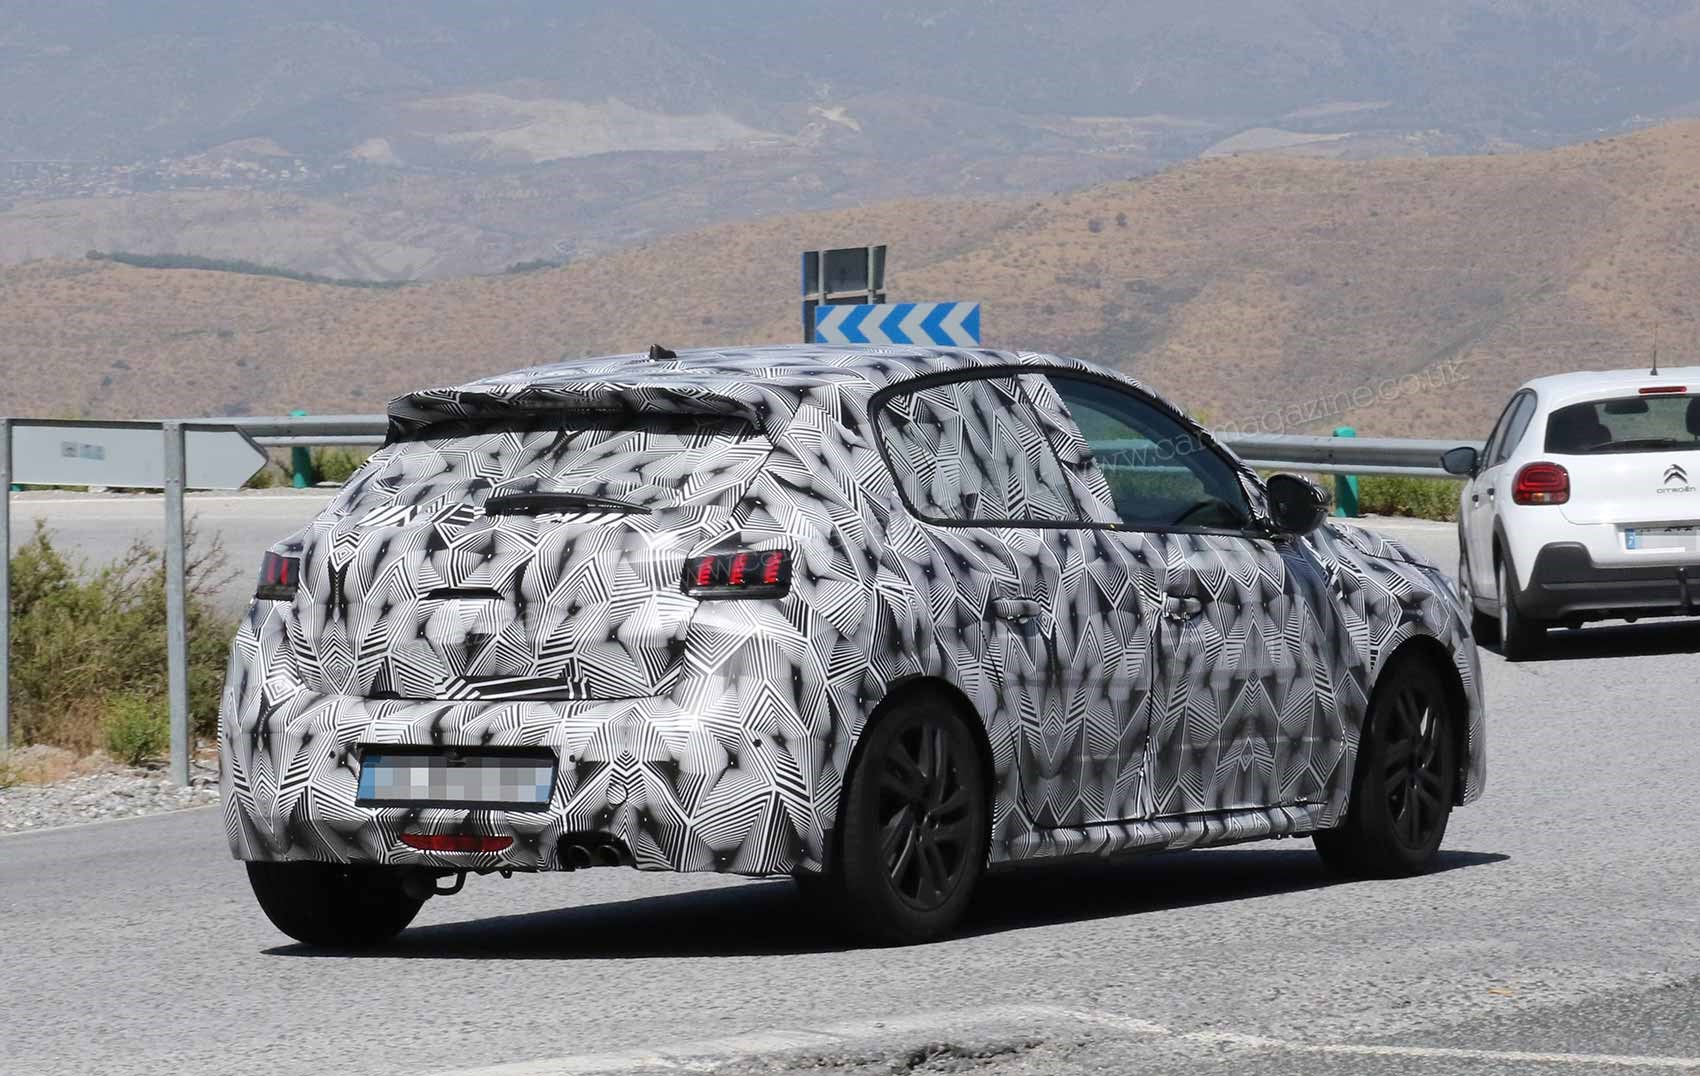 New 2019 Peugeot 208 Spy Photos Car Magazine